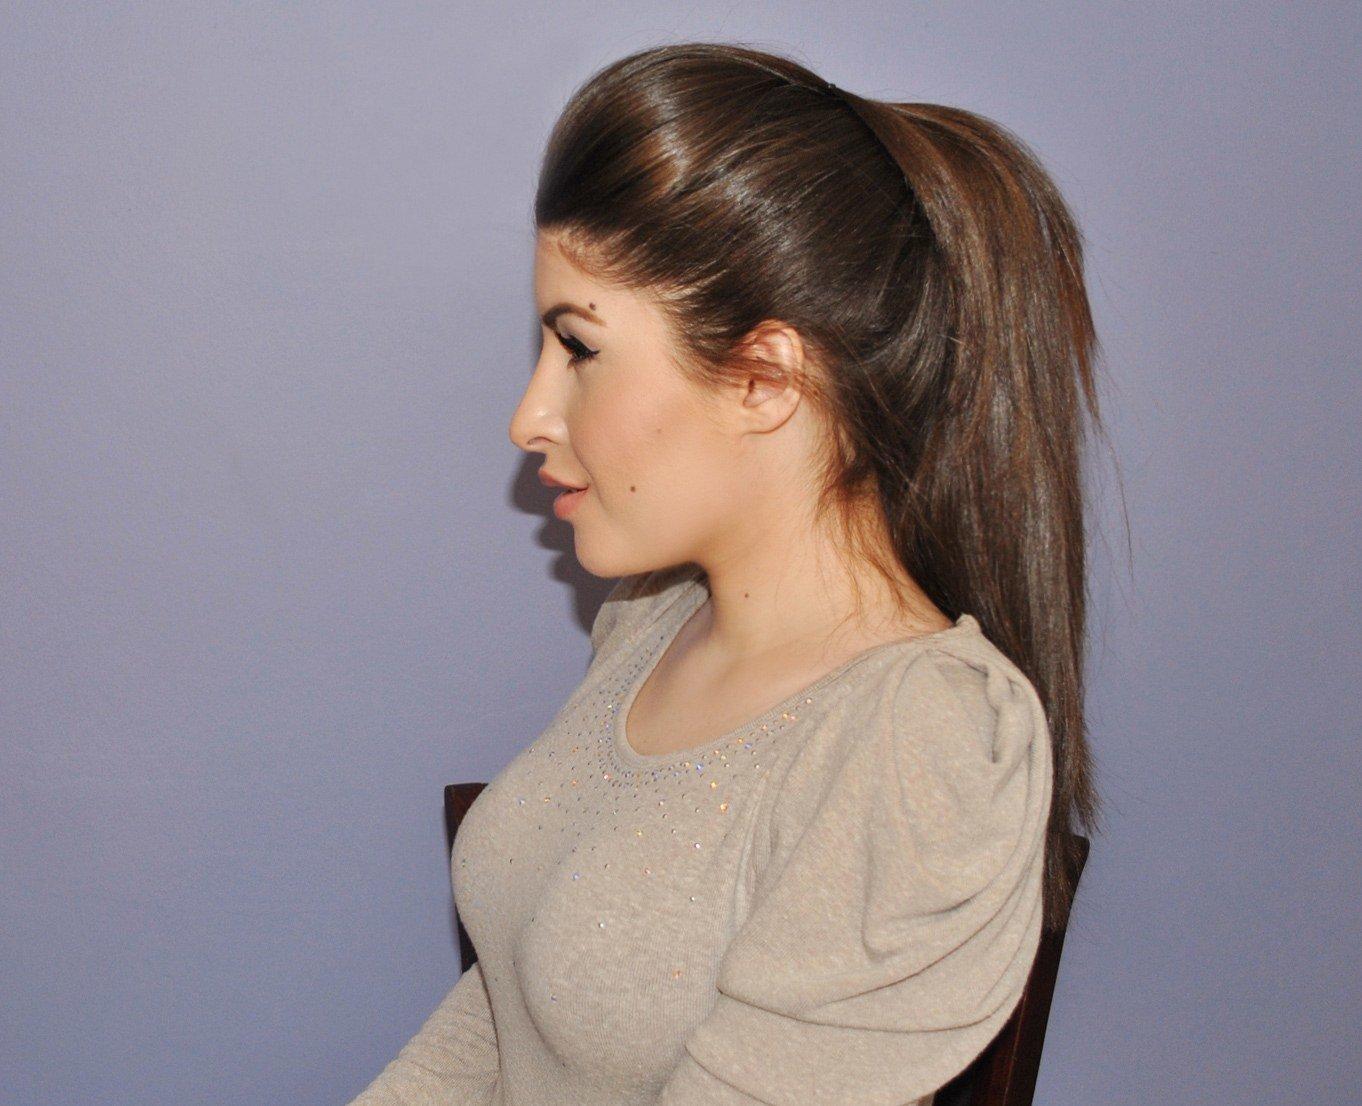 Últimos e surpreendentes penteados de inverno excelentes para as meninas da escola: